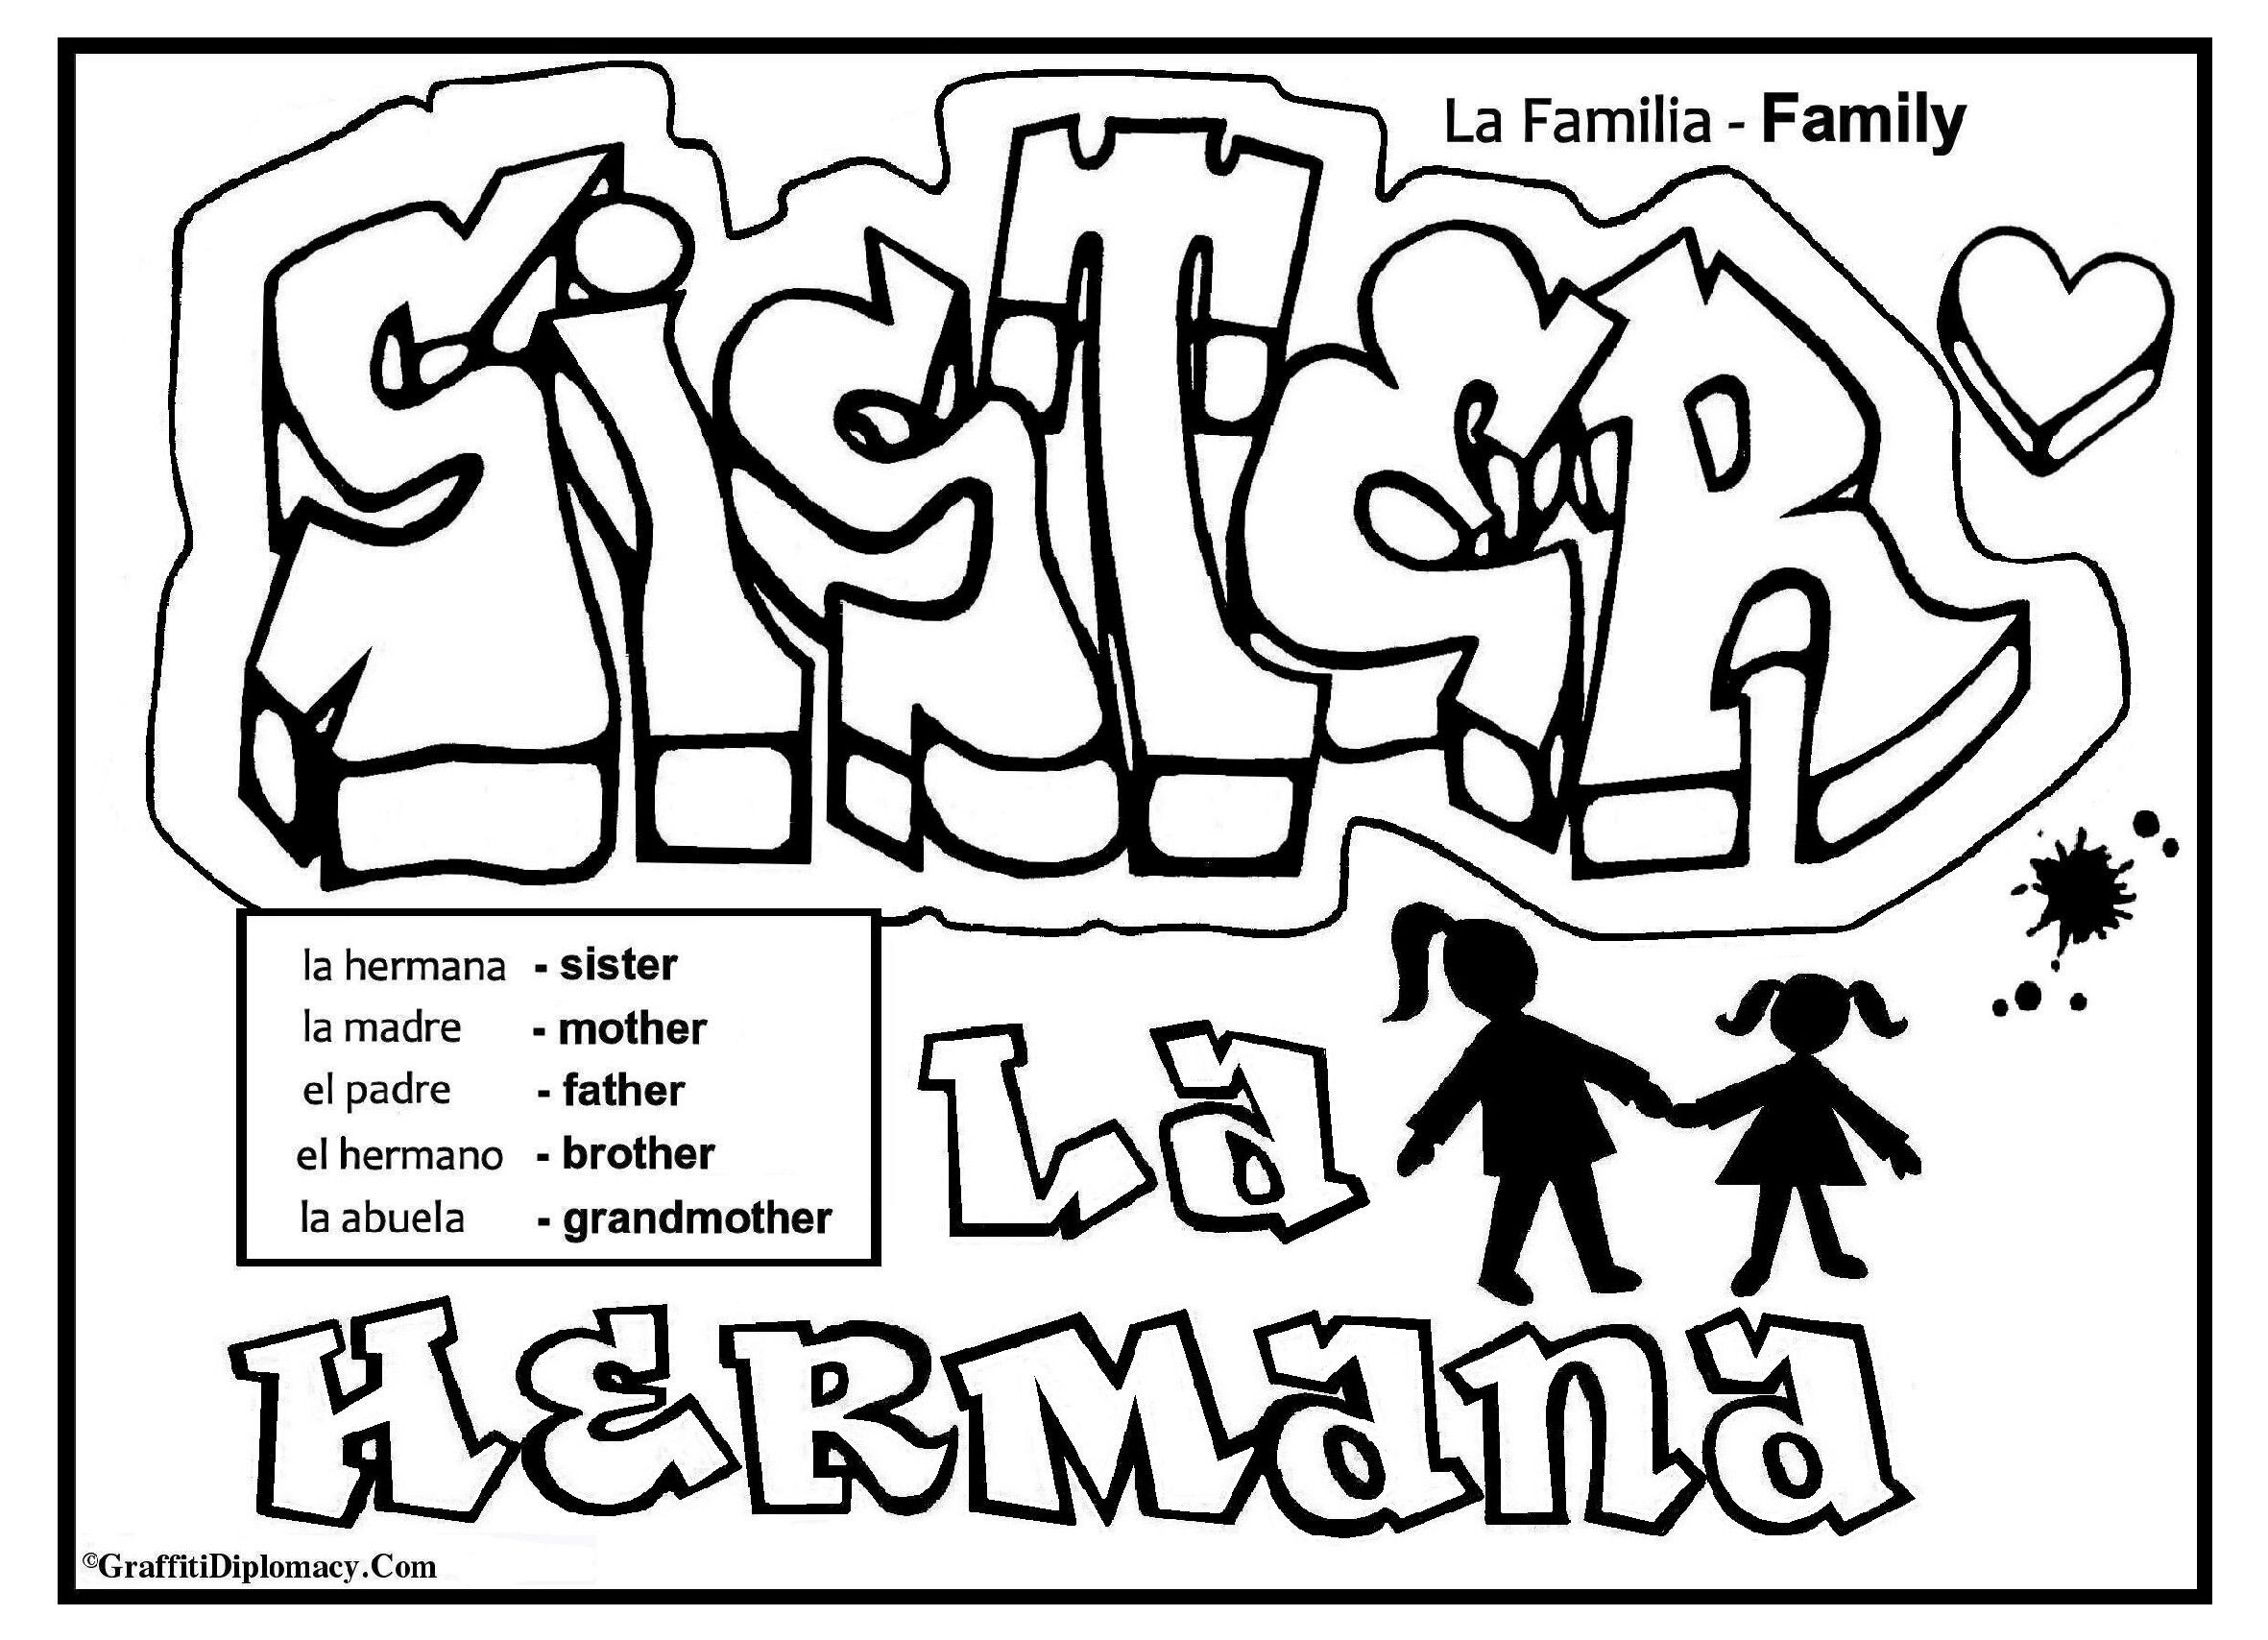 English Spanish Free Printable Graffiti Coloring Page